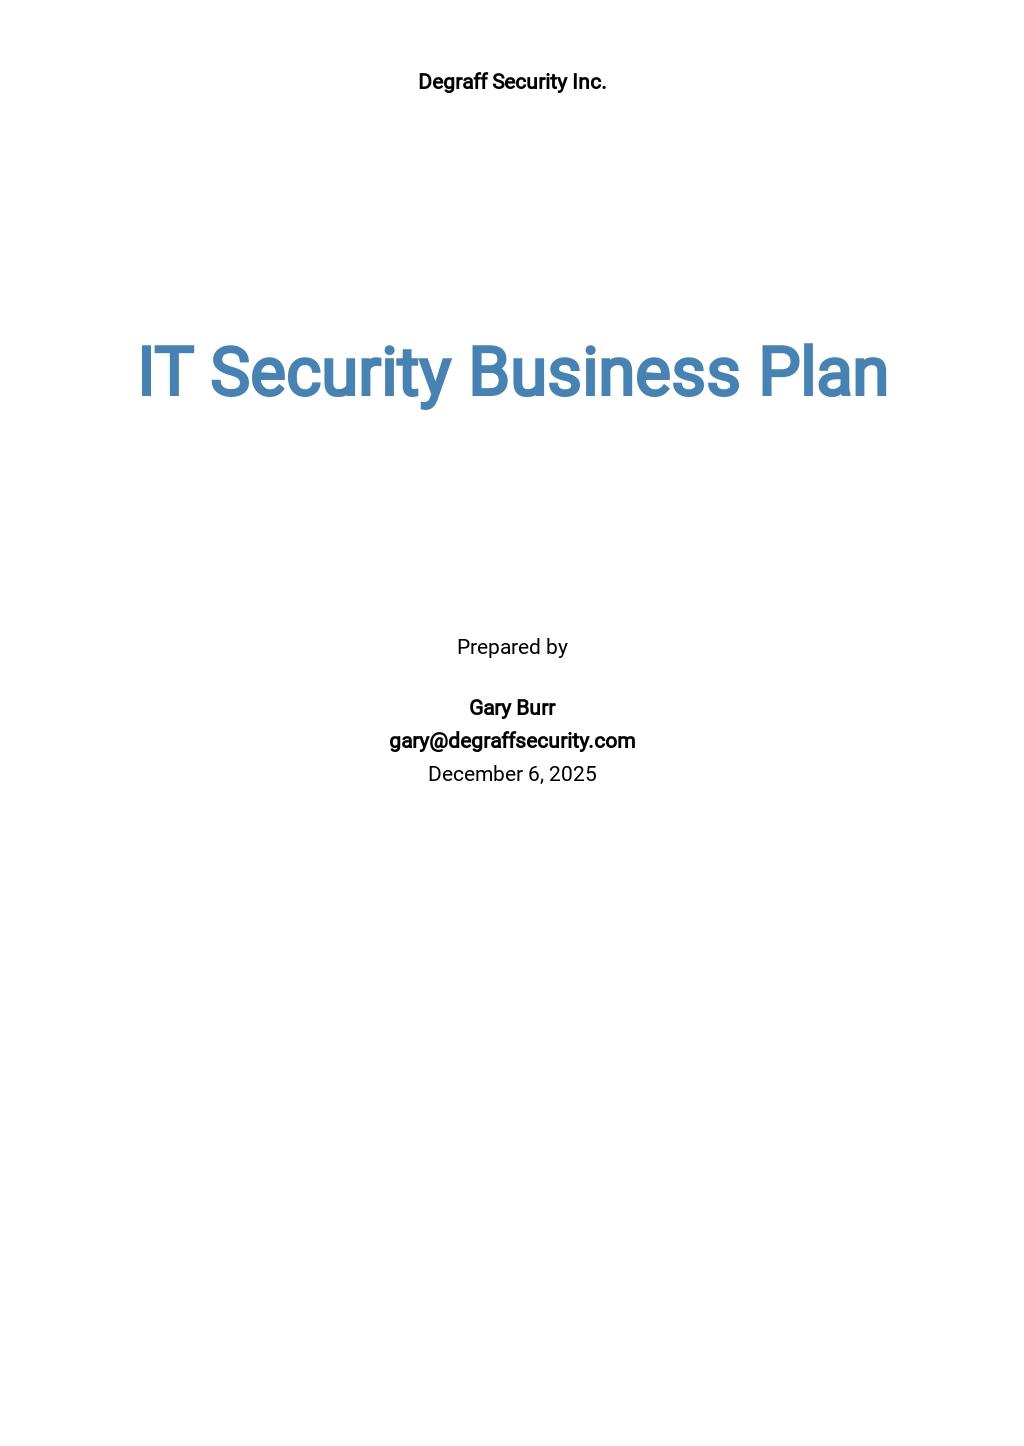 IT Security Business Plan Template.jpe